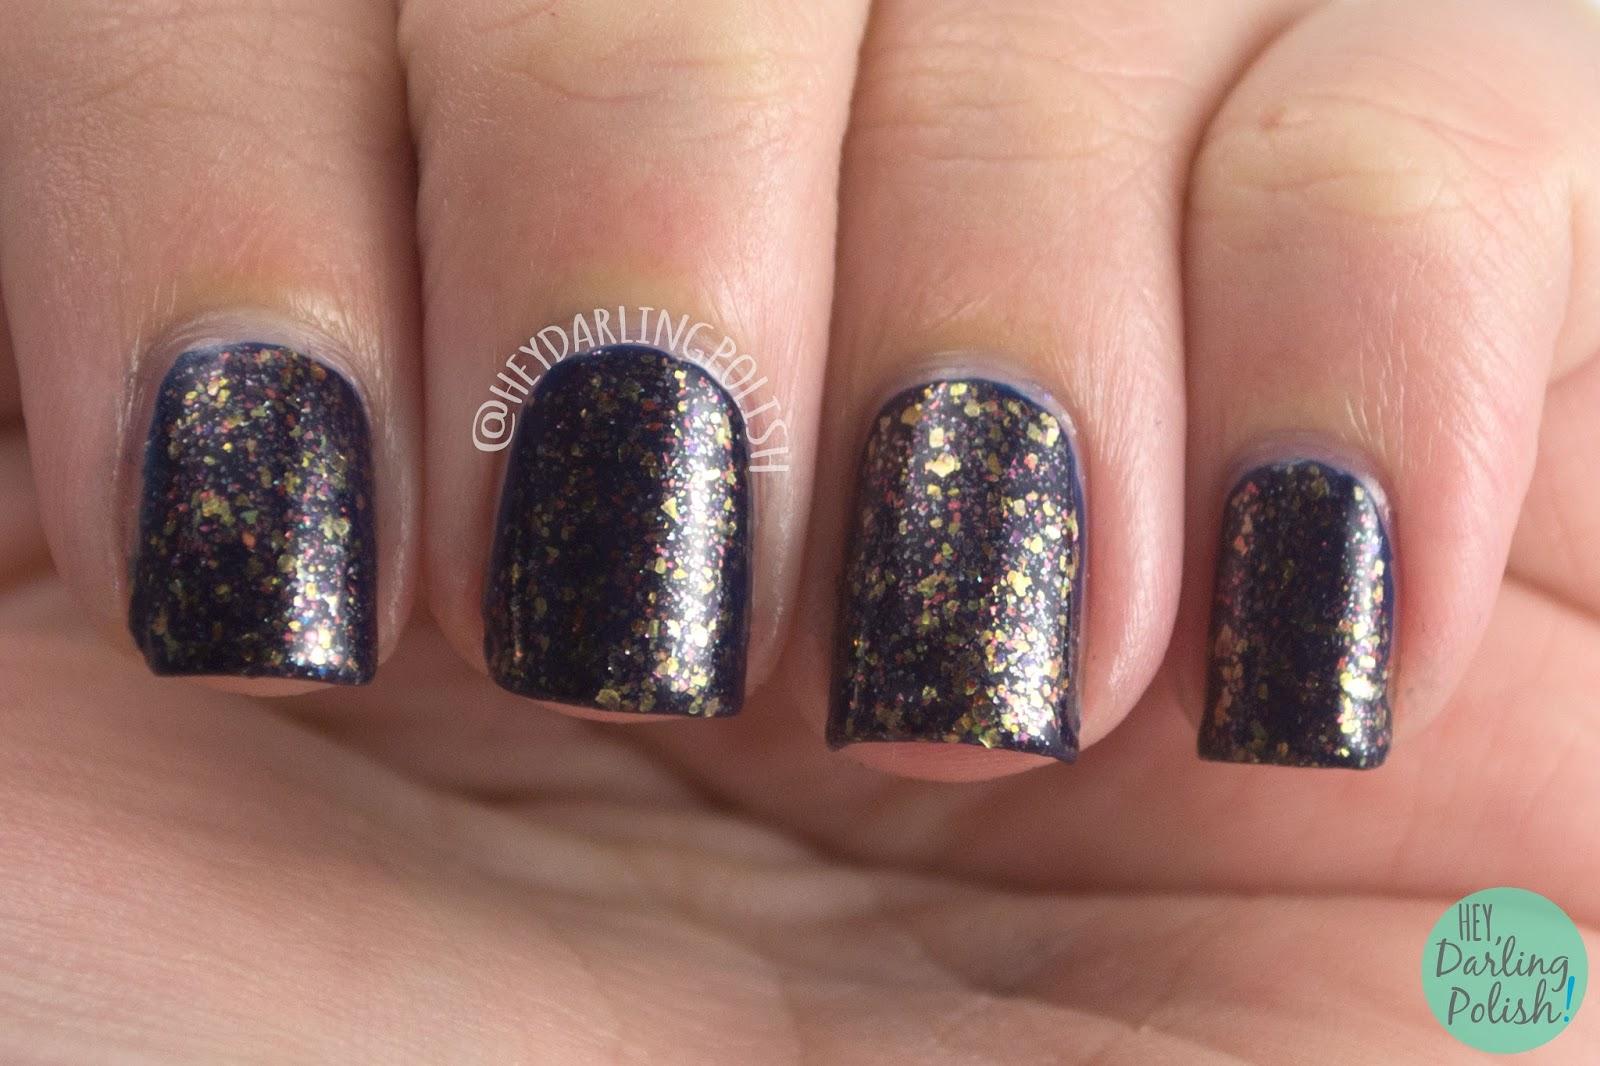 nails, nail polish, polish, indie nail polish, indie polish, nvr enuff polish, nvr enuff, spice world, spice girls, hey darling polish, swatch, scary, flakies, gold